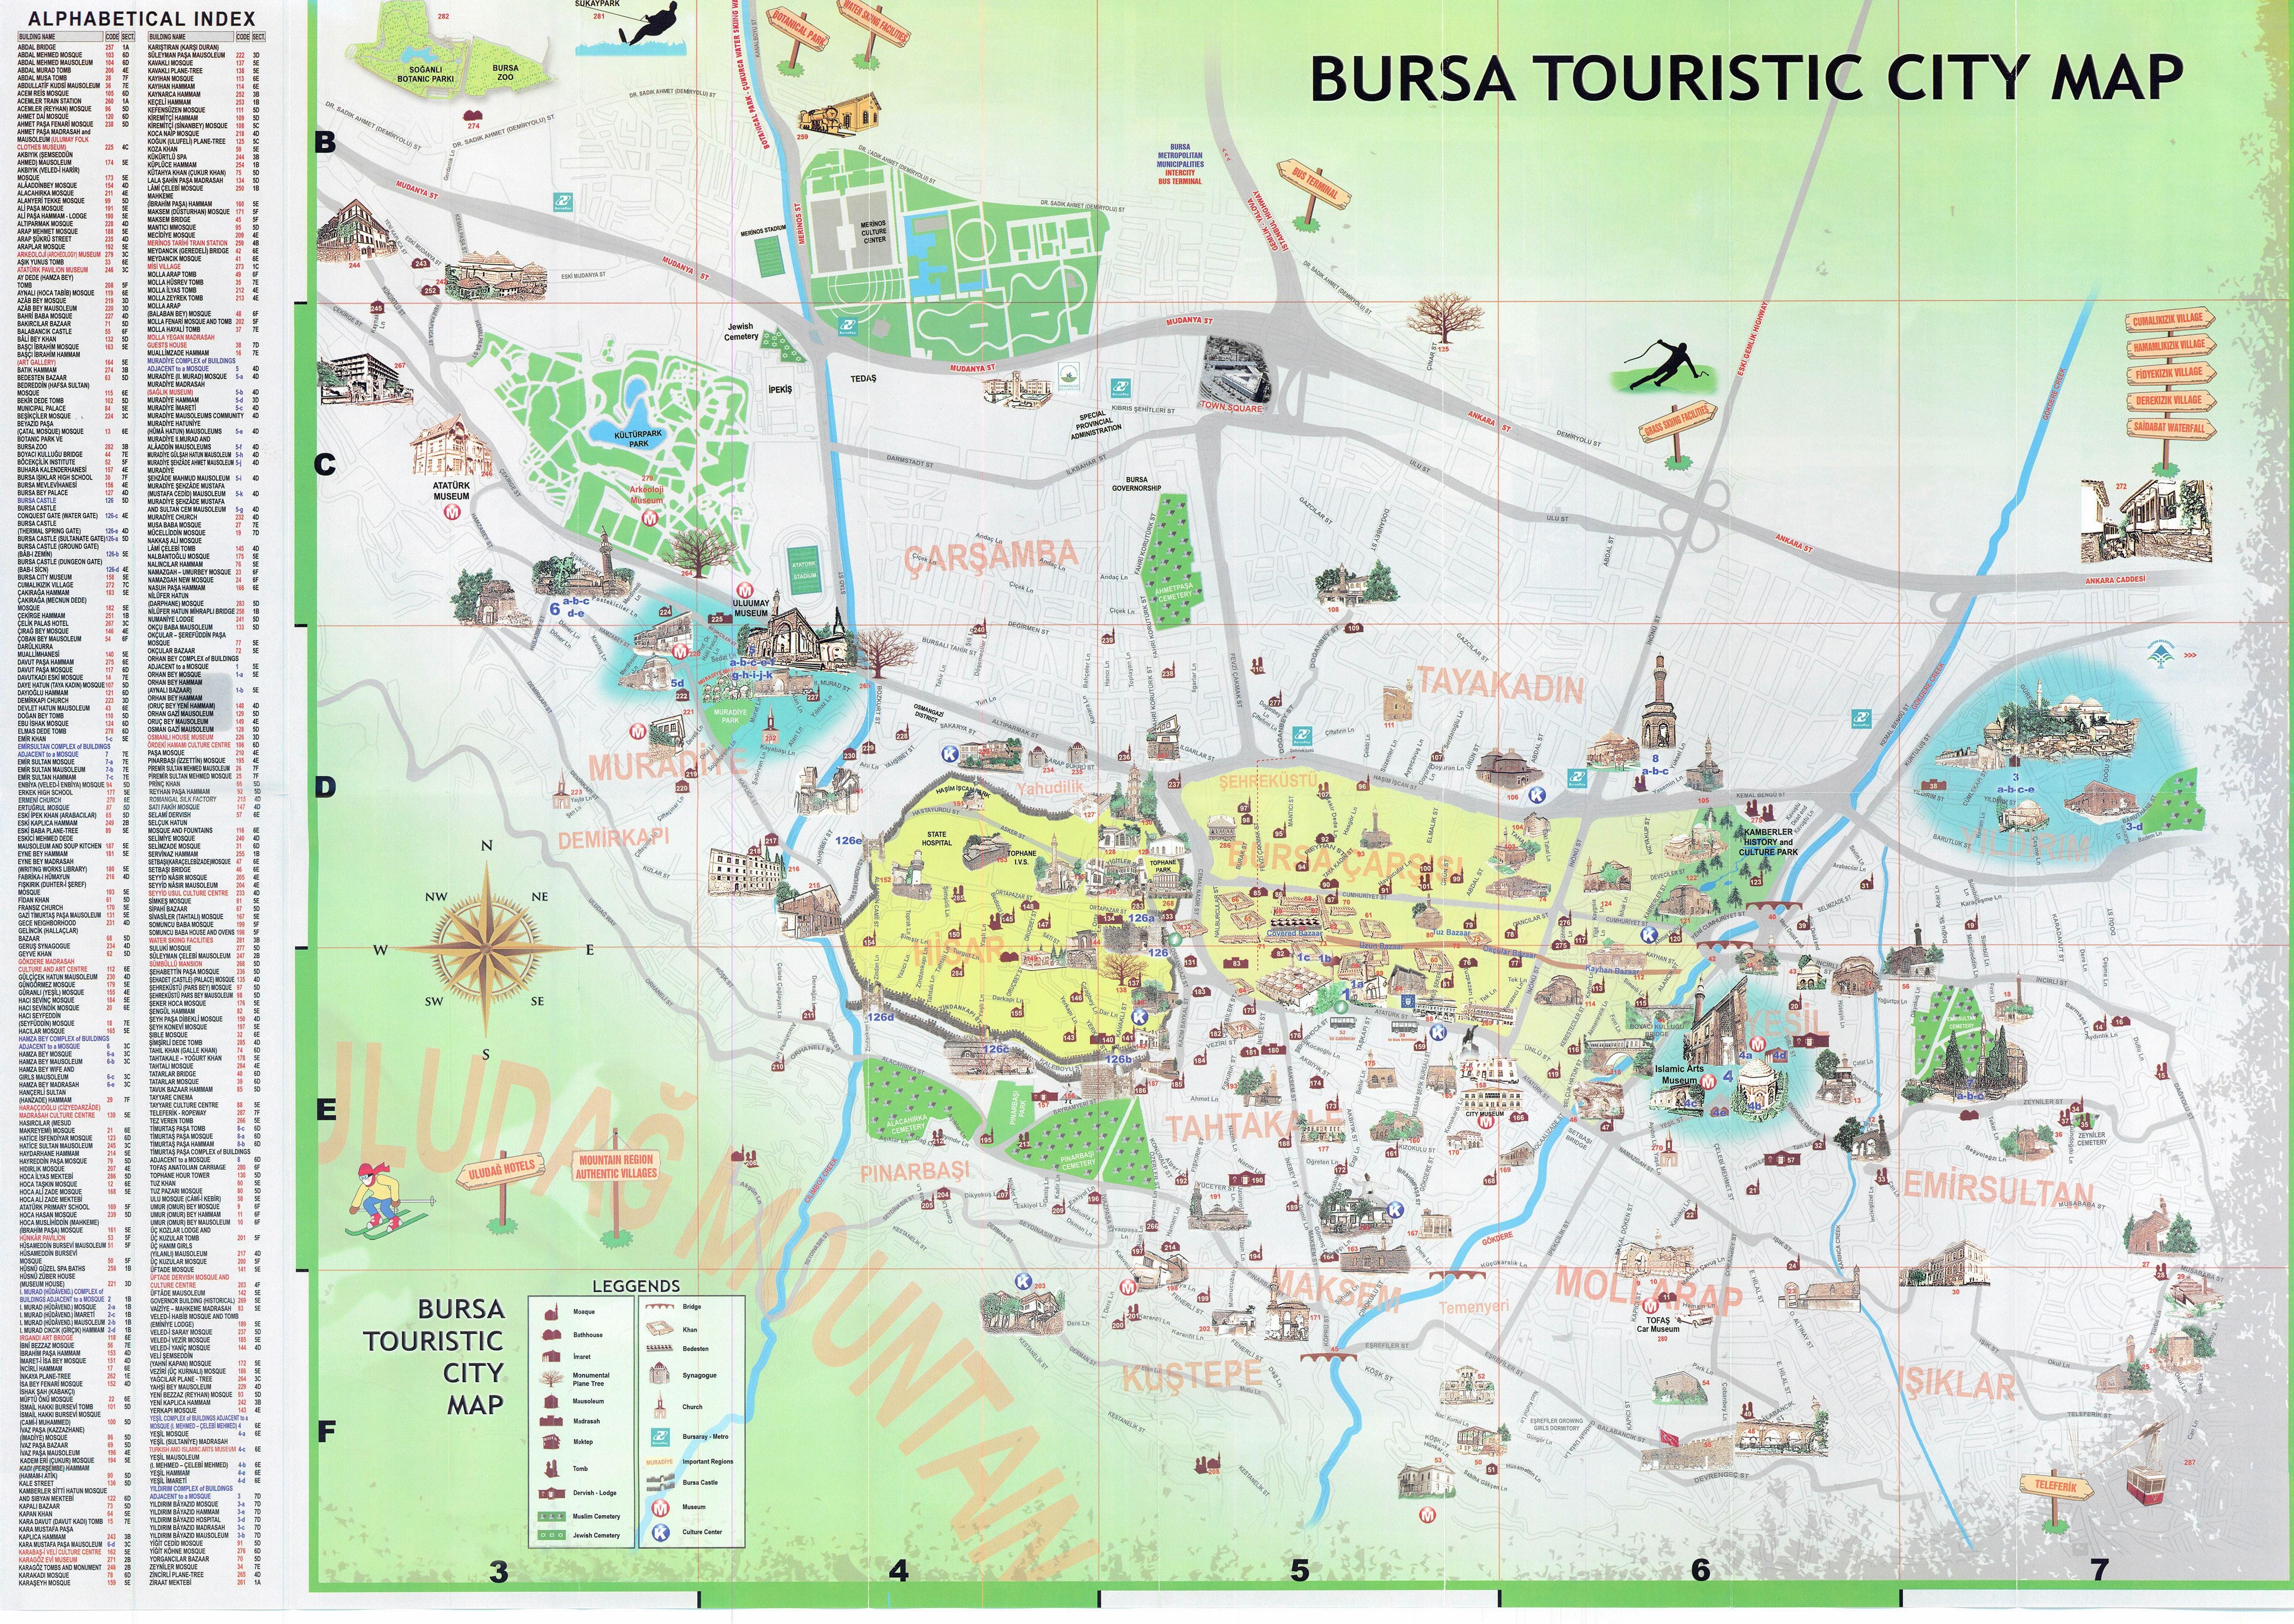 http://www.orangesmile.com/common/img_city_maps/bursa-map-0.jpg